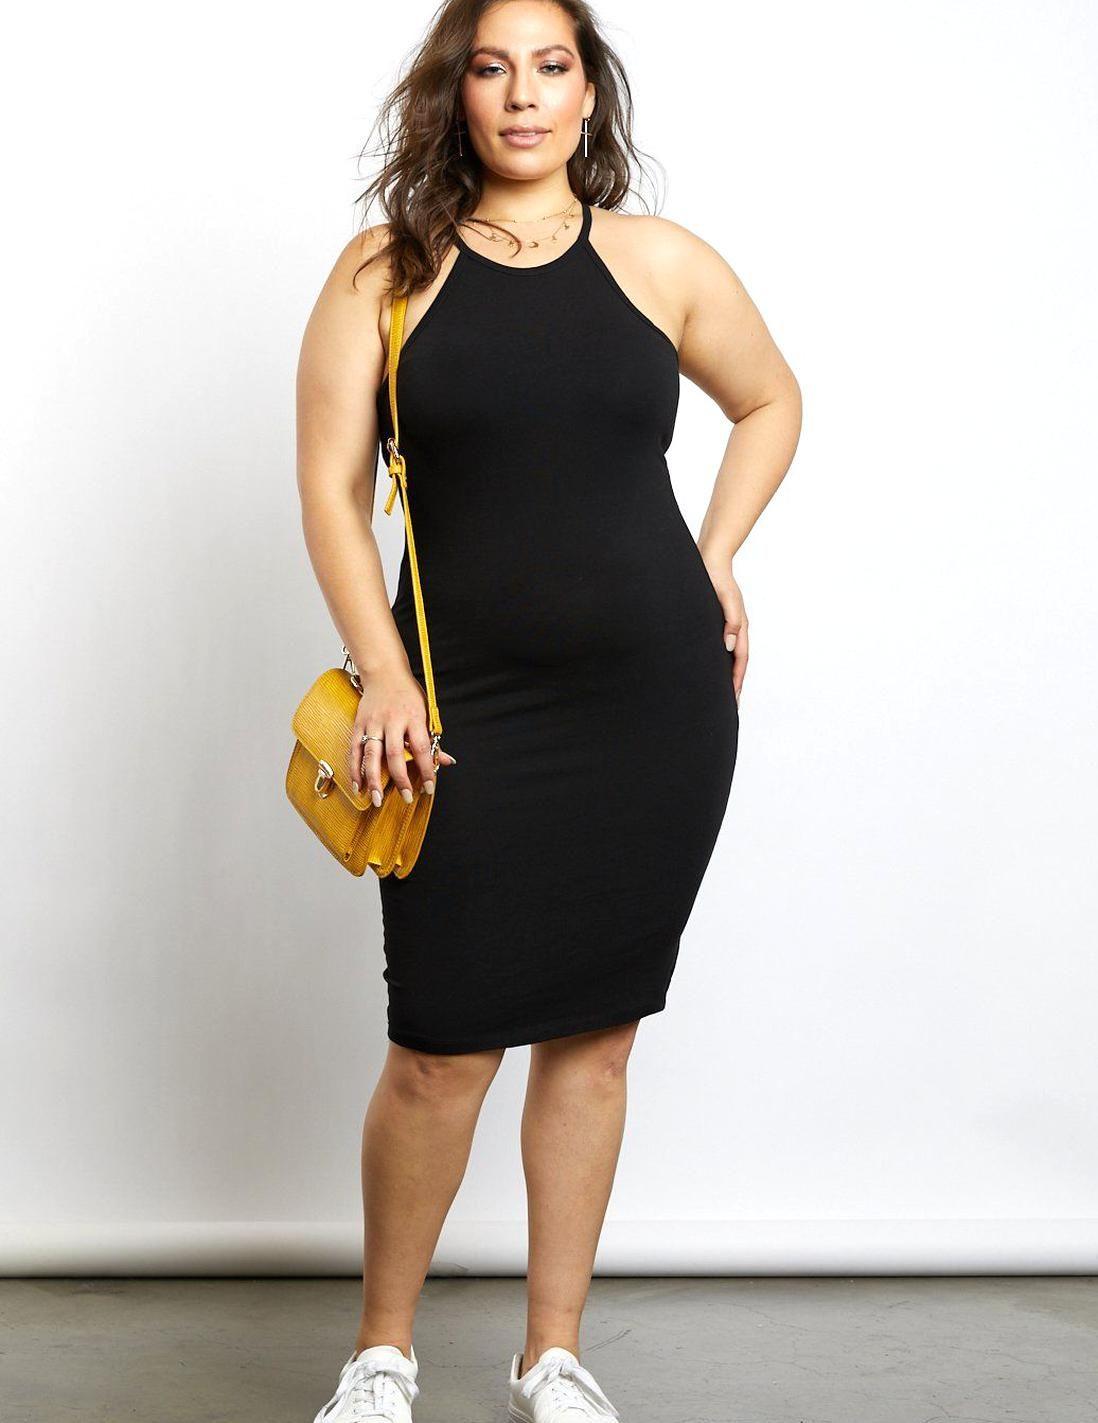 Plus Size Alexa Halter Racerback Dress Plus Size Midi Bodycon Dresses 2020ave In 2020 Plus Size Outfits Racerback Dress Fashion [ 1423 x 1098 Pixel ]